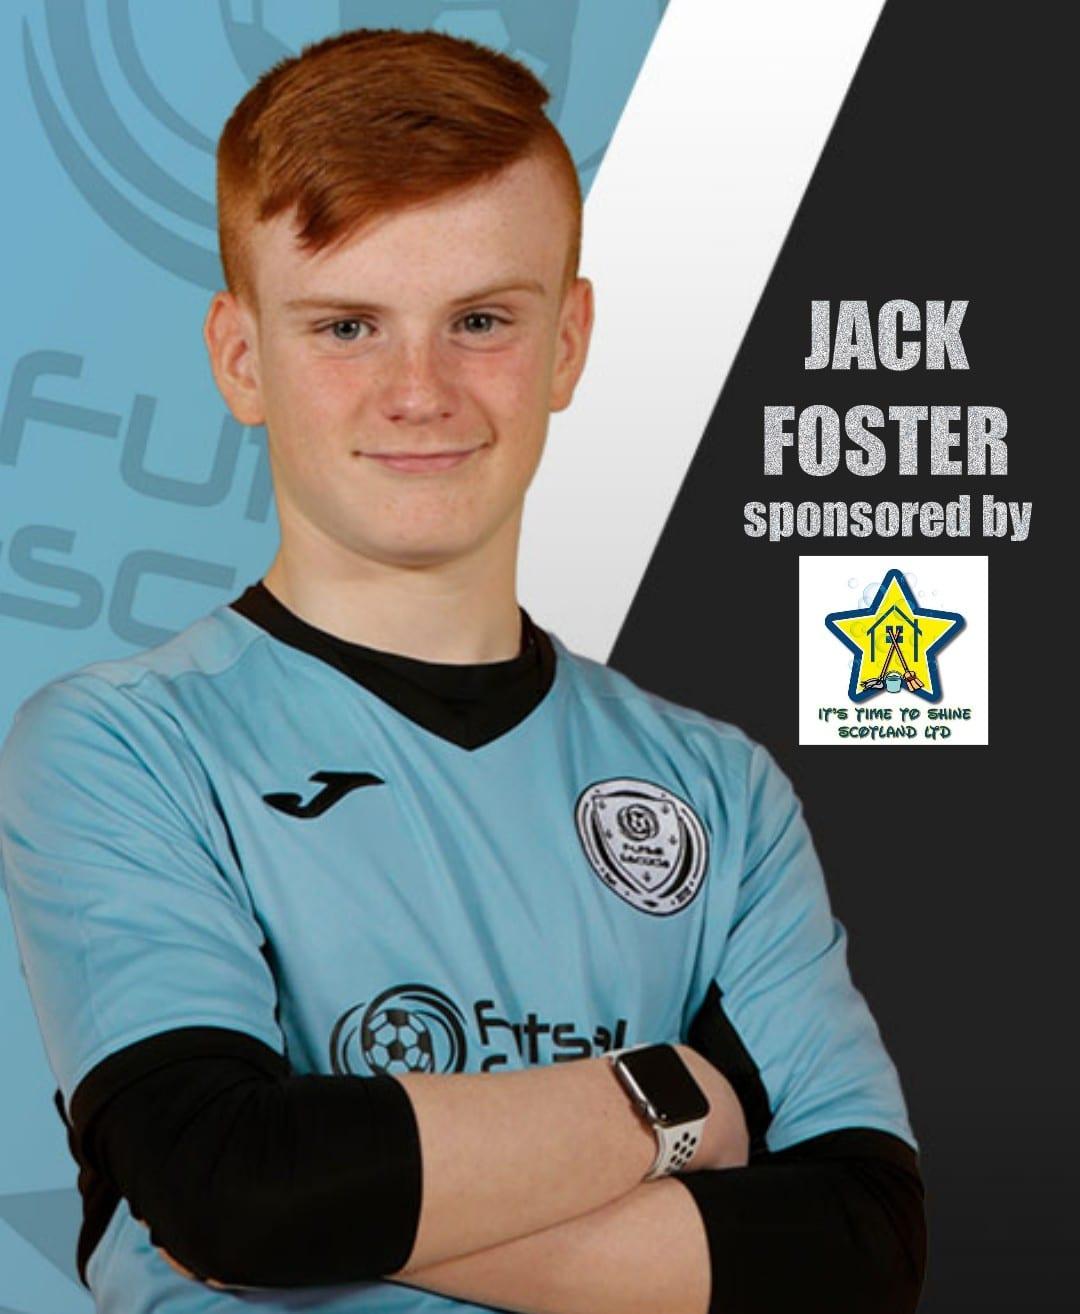 Jack Foster